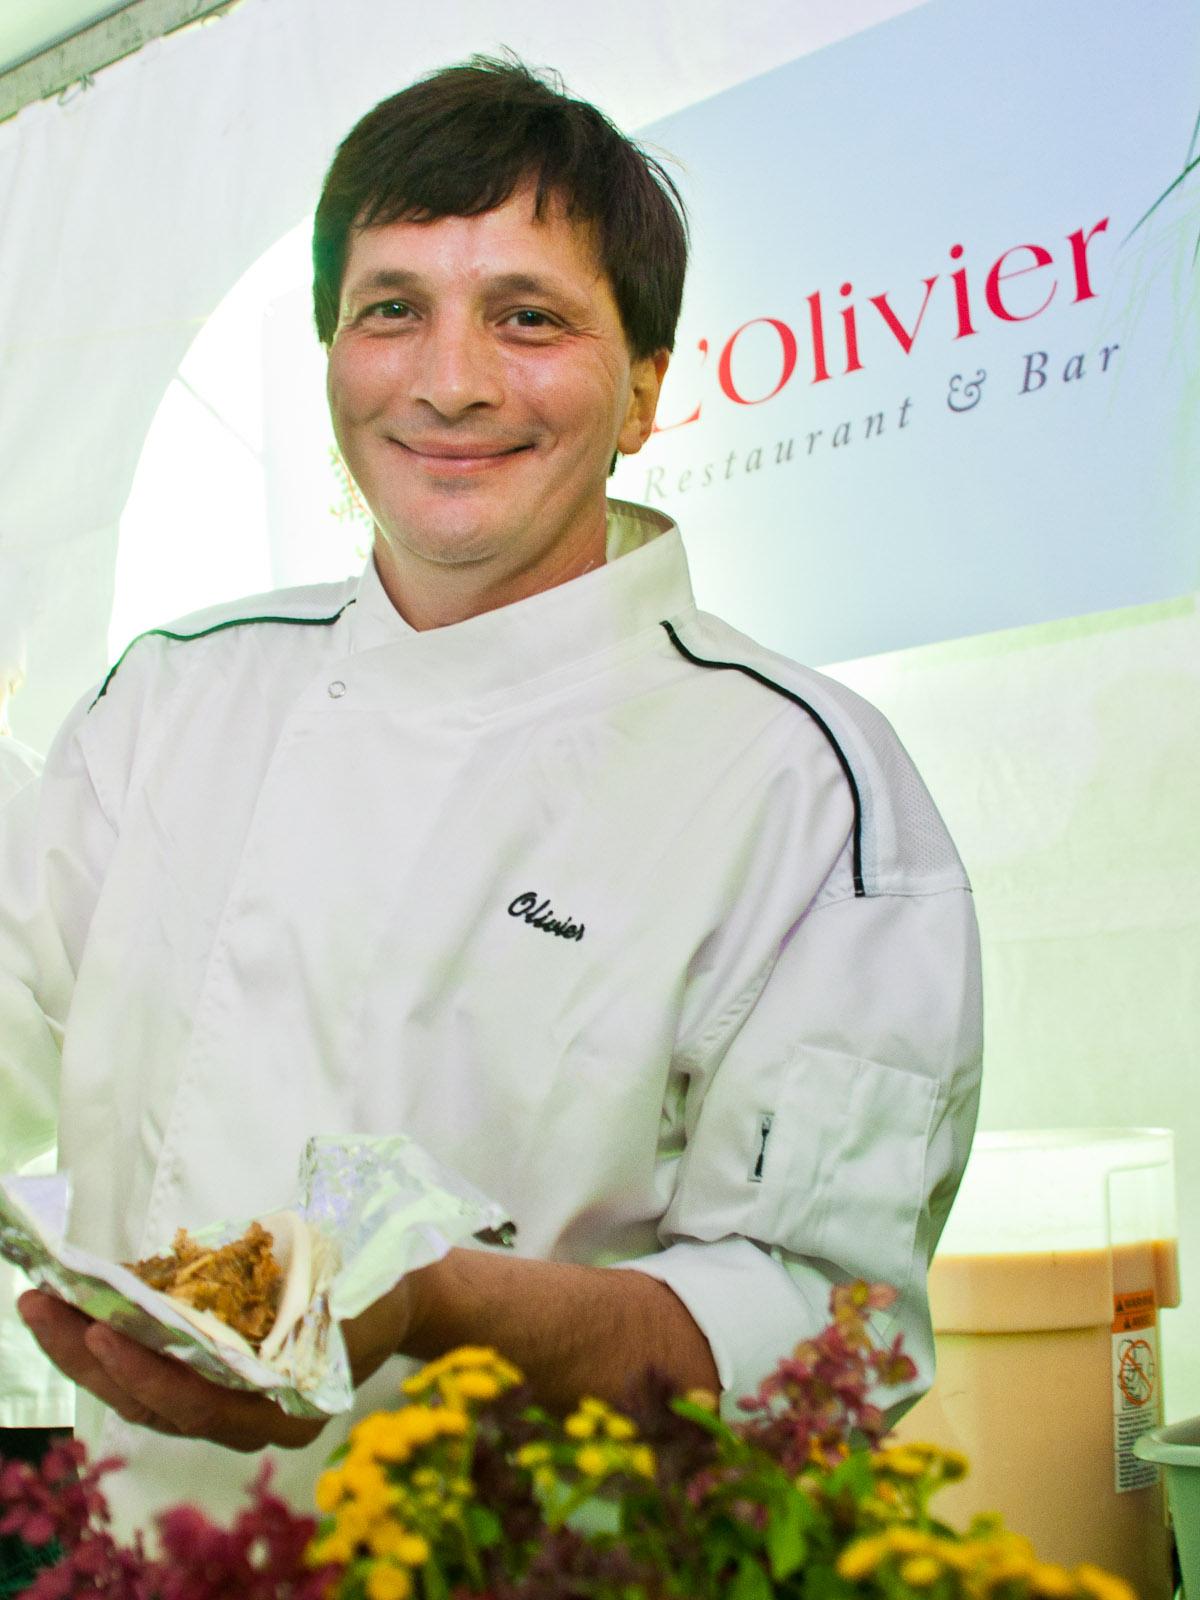 News_004_Central Market_10th Anniversary_June 2011_Olivier Ciesielski